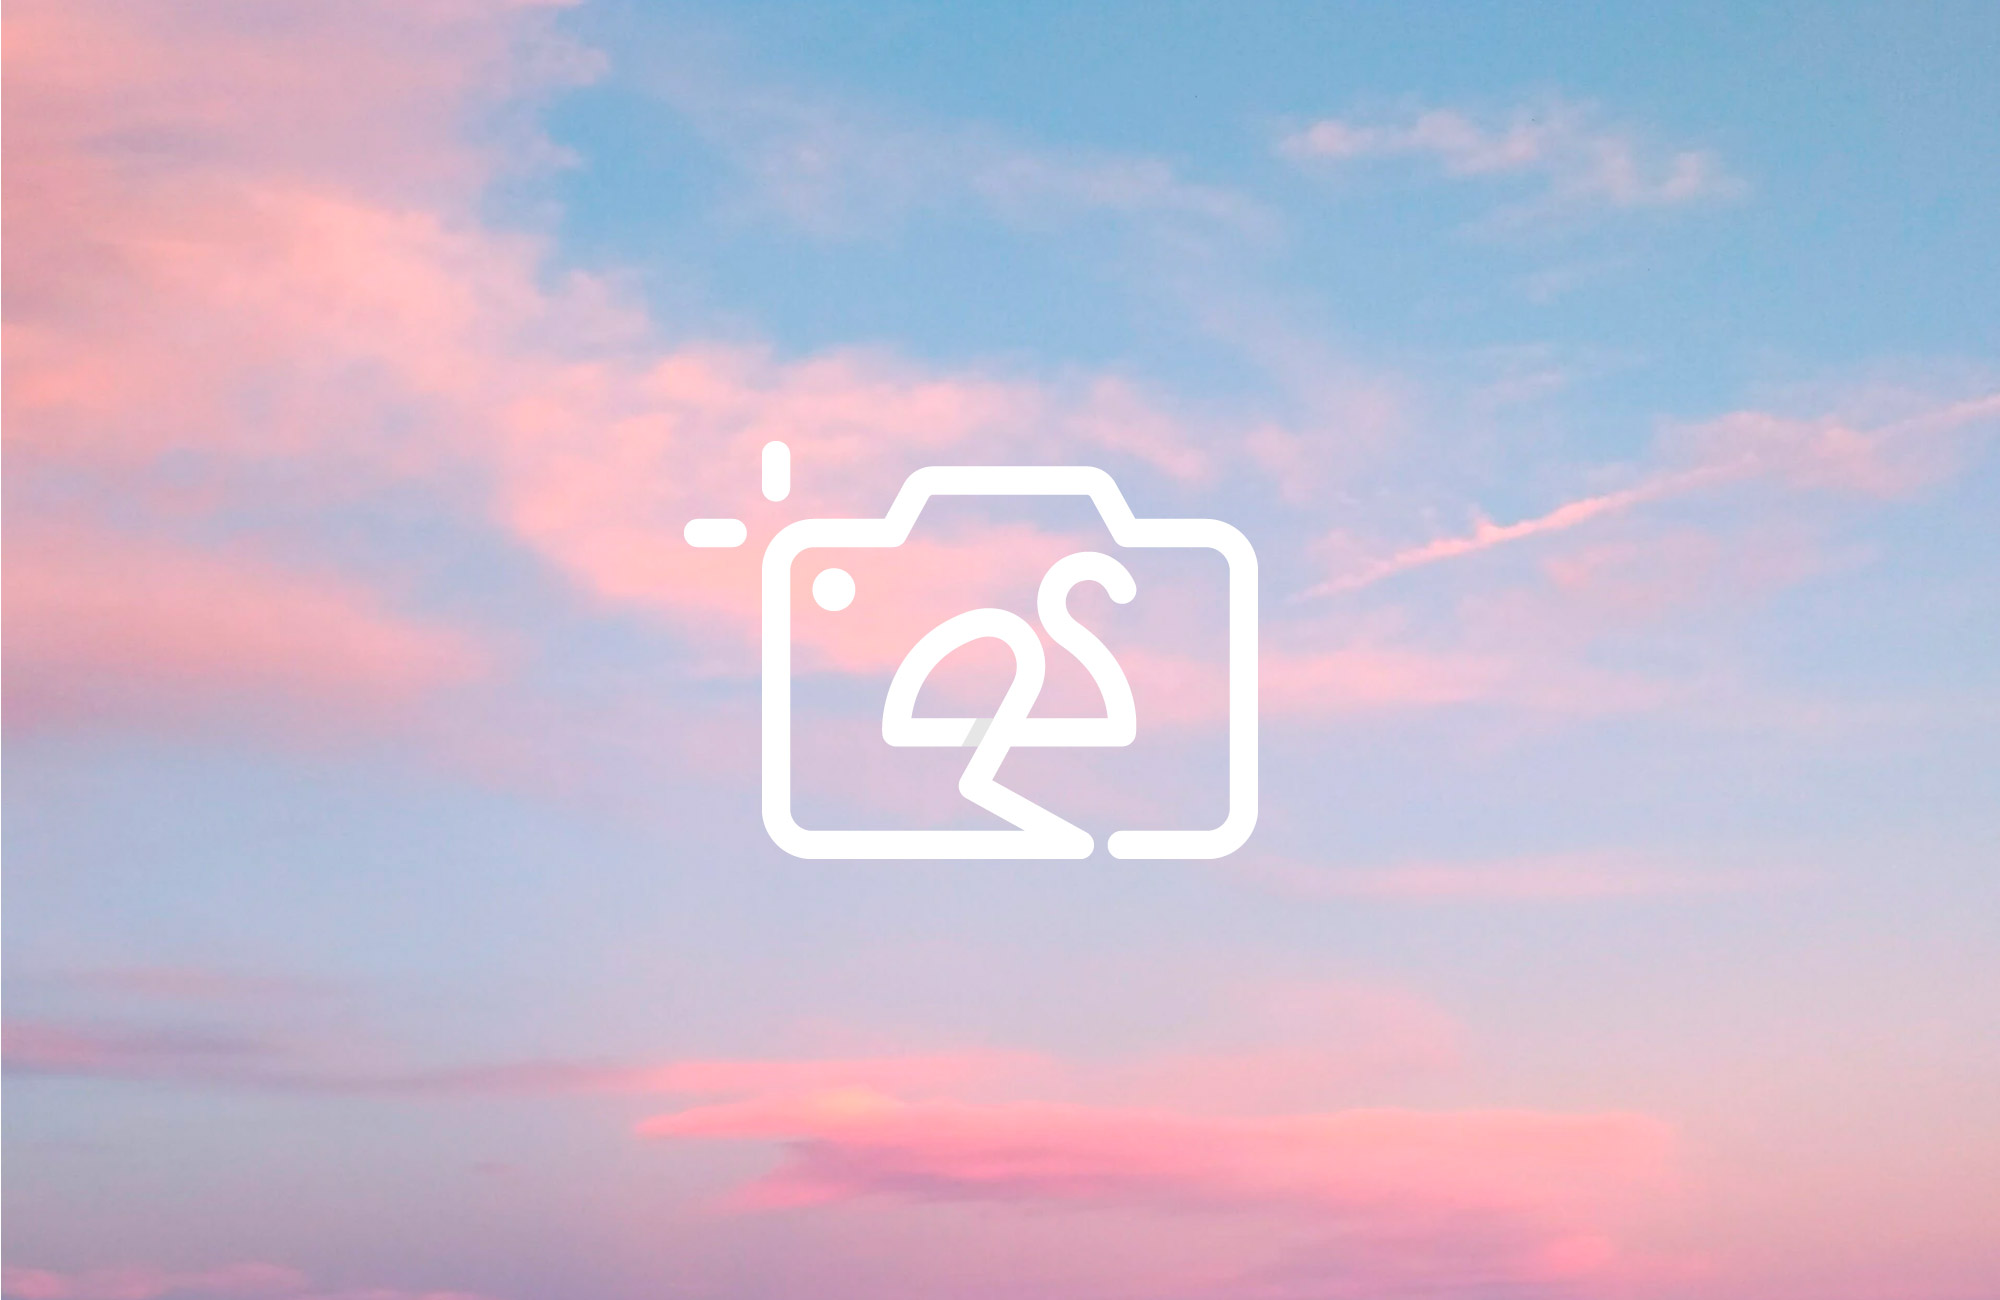 boom-agencia-marketing-digital-branding-ola-studio-fotografia-logo